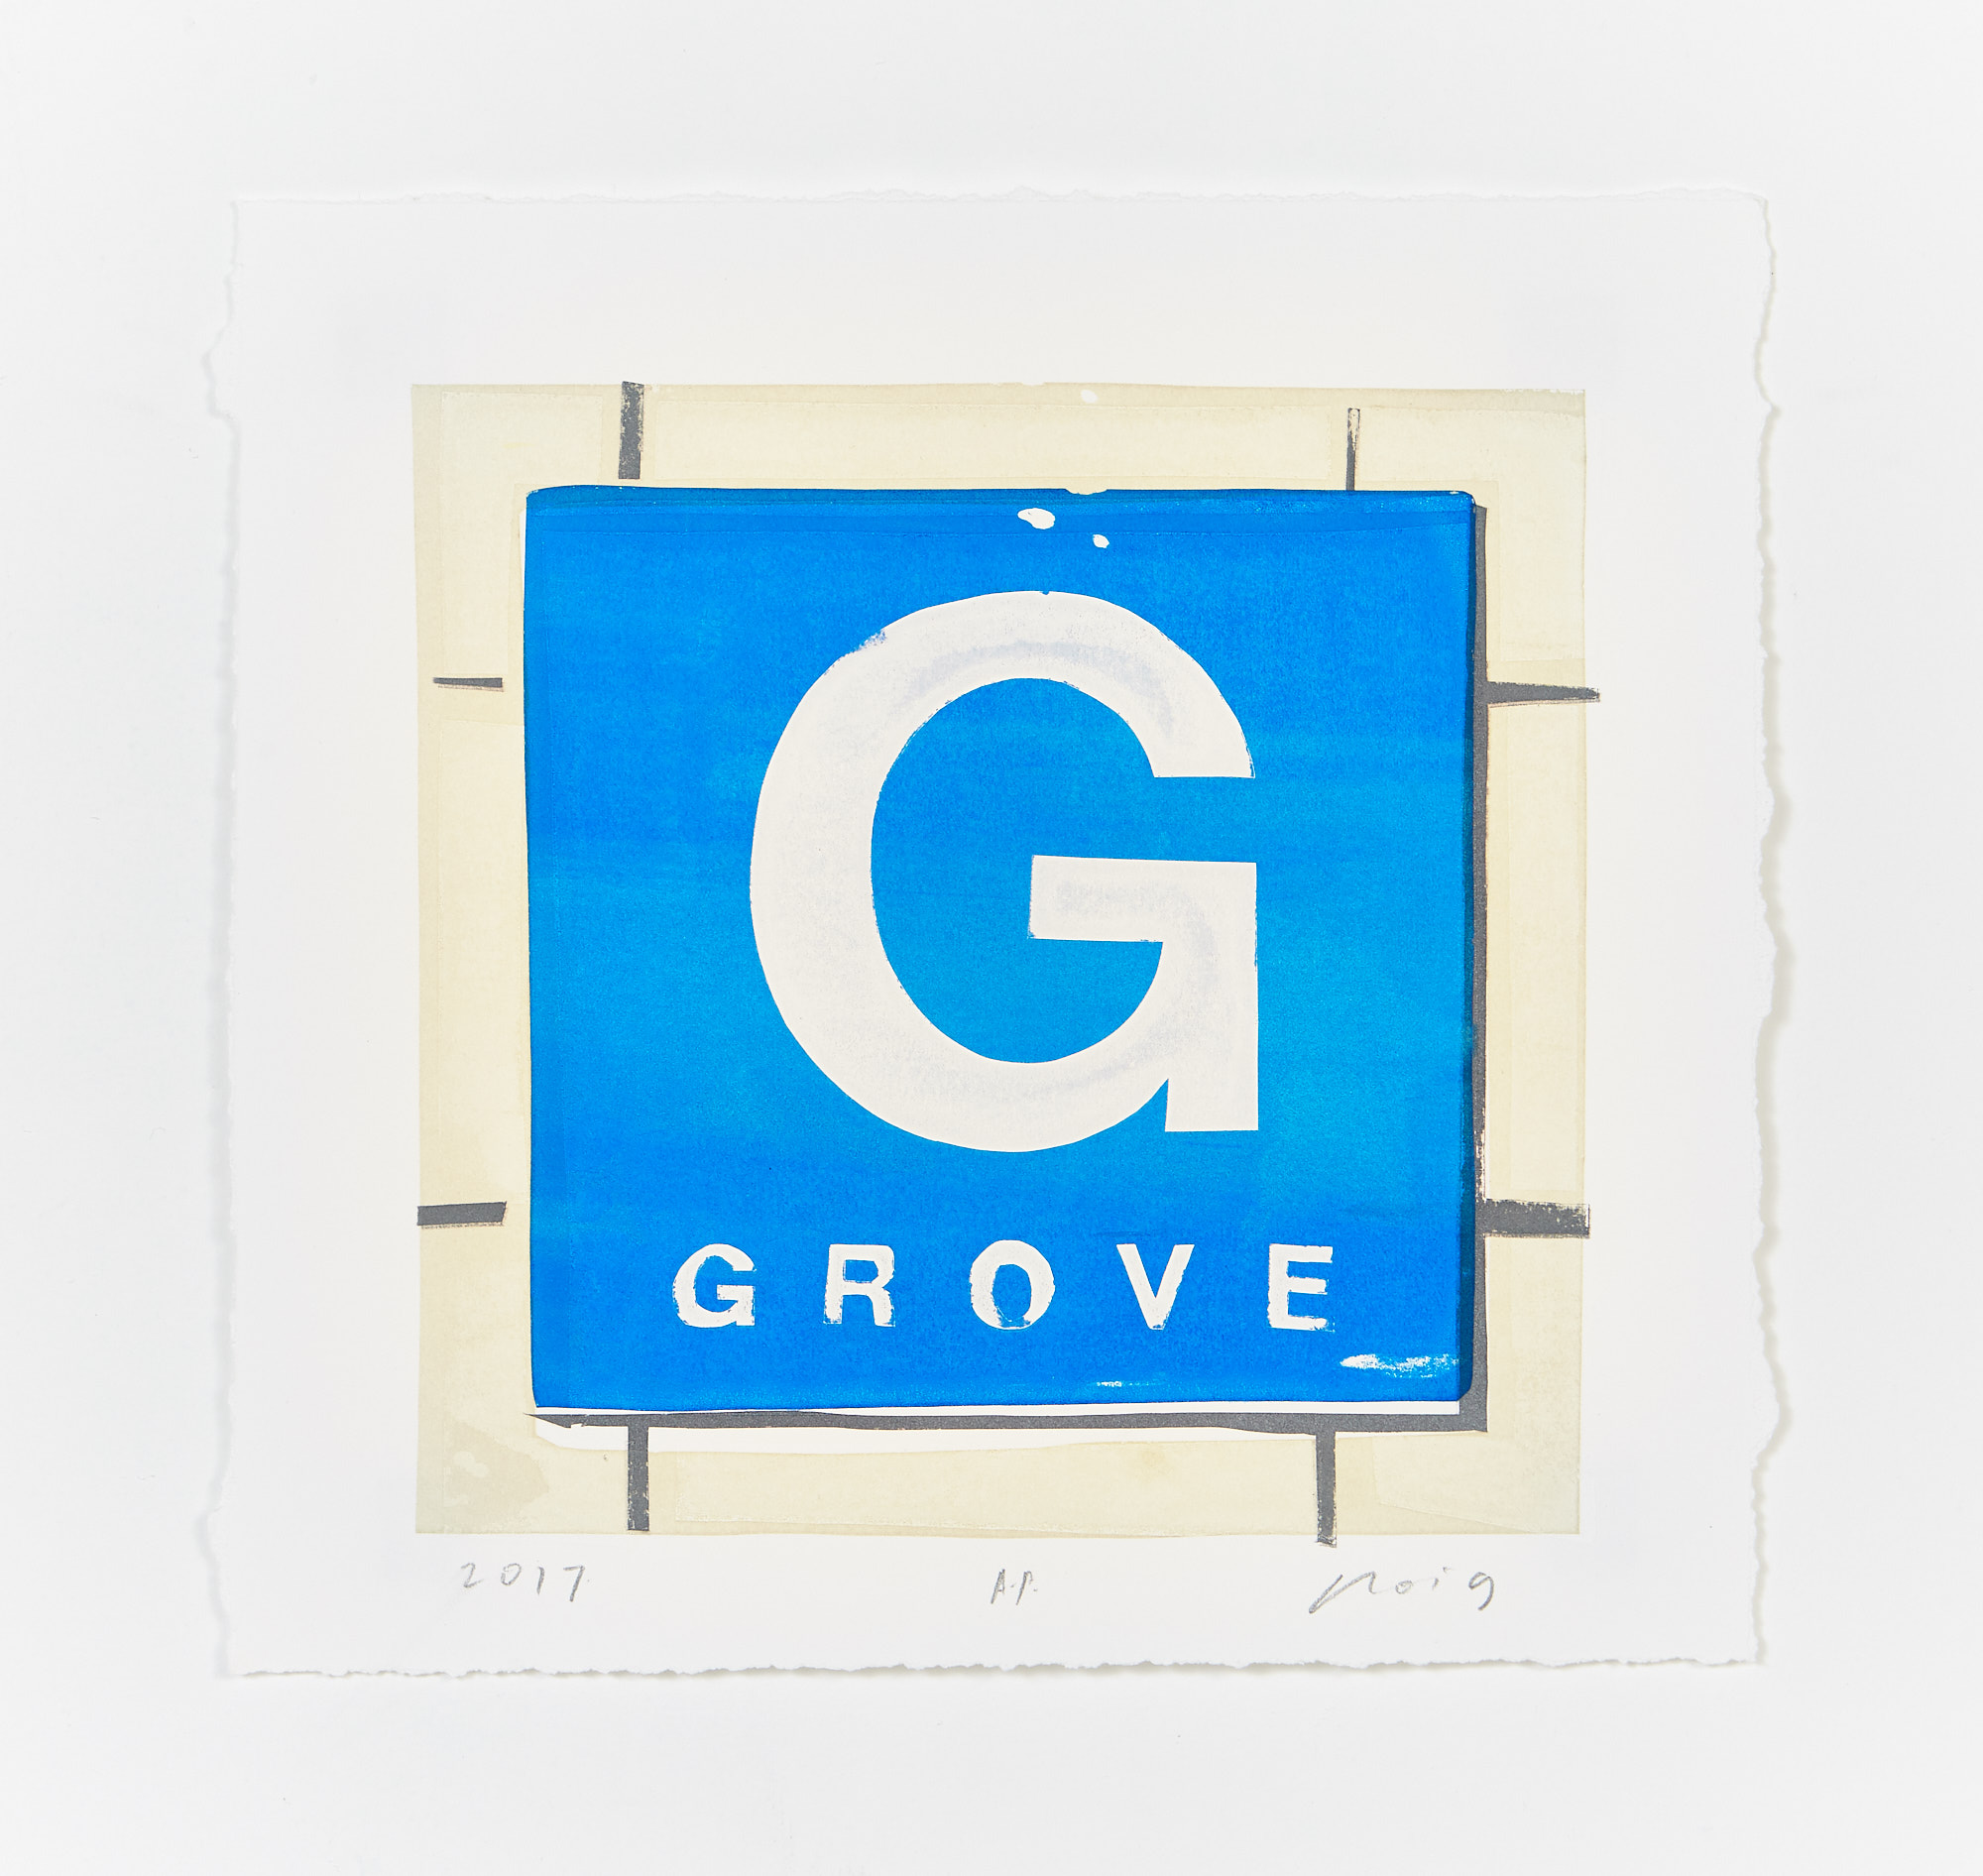 "Grove G"" 2017"